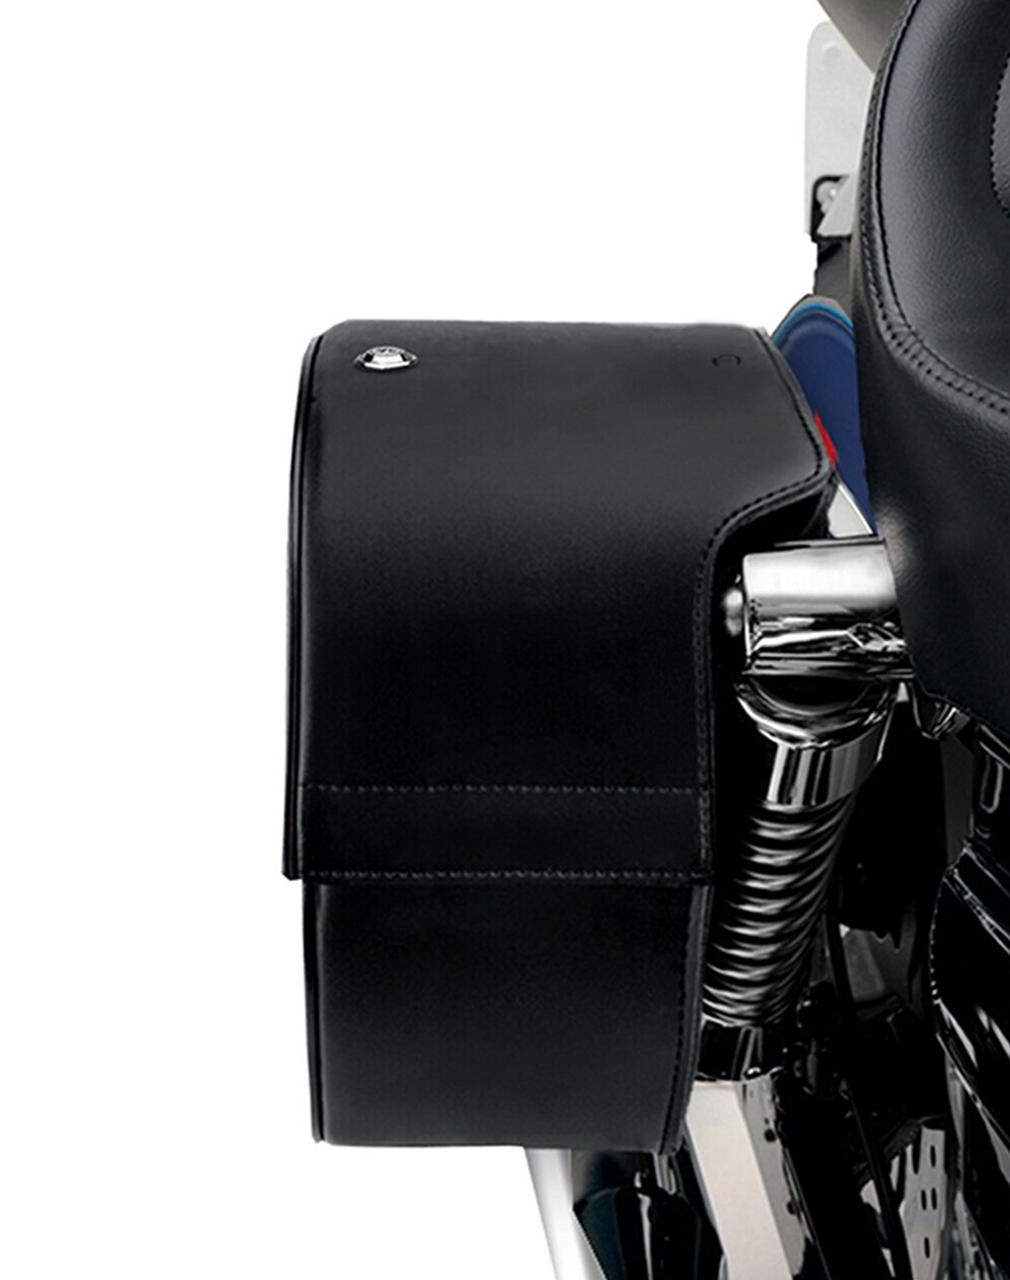 Viking Large Shock Cutout Warrior Slanted Motorcycle Saddlebags For Harley Sportster 883 Custom XL883C Shock Cutout View